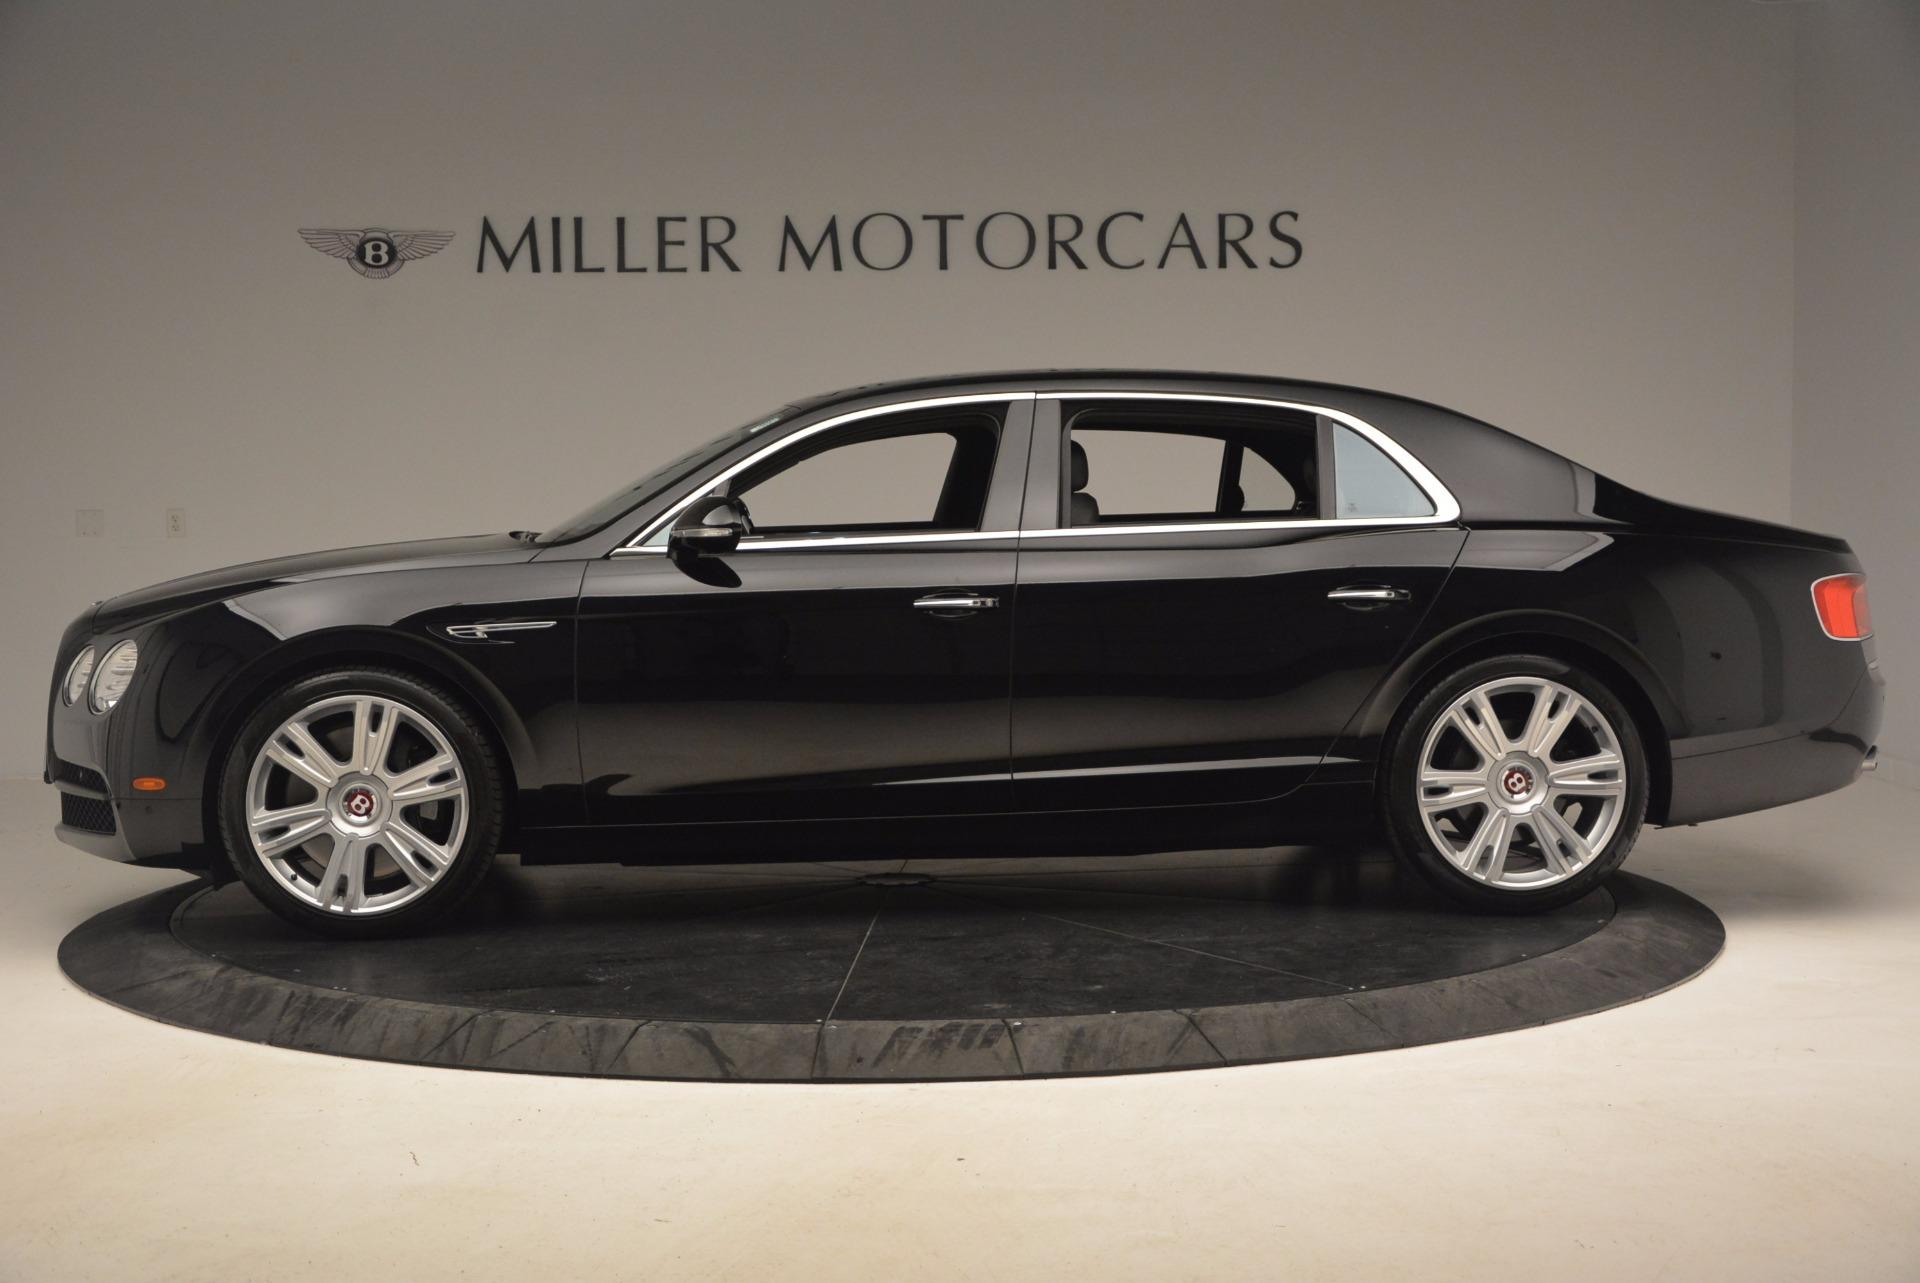 Used 2015 Bentley Flying Spur V8 For Sale In Westport, CT 1199_p3